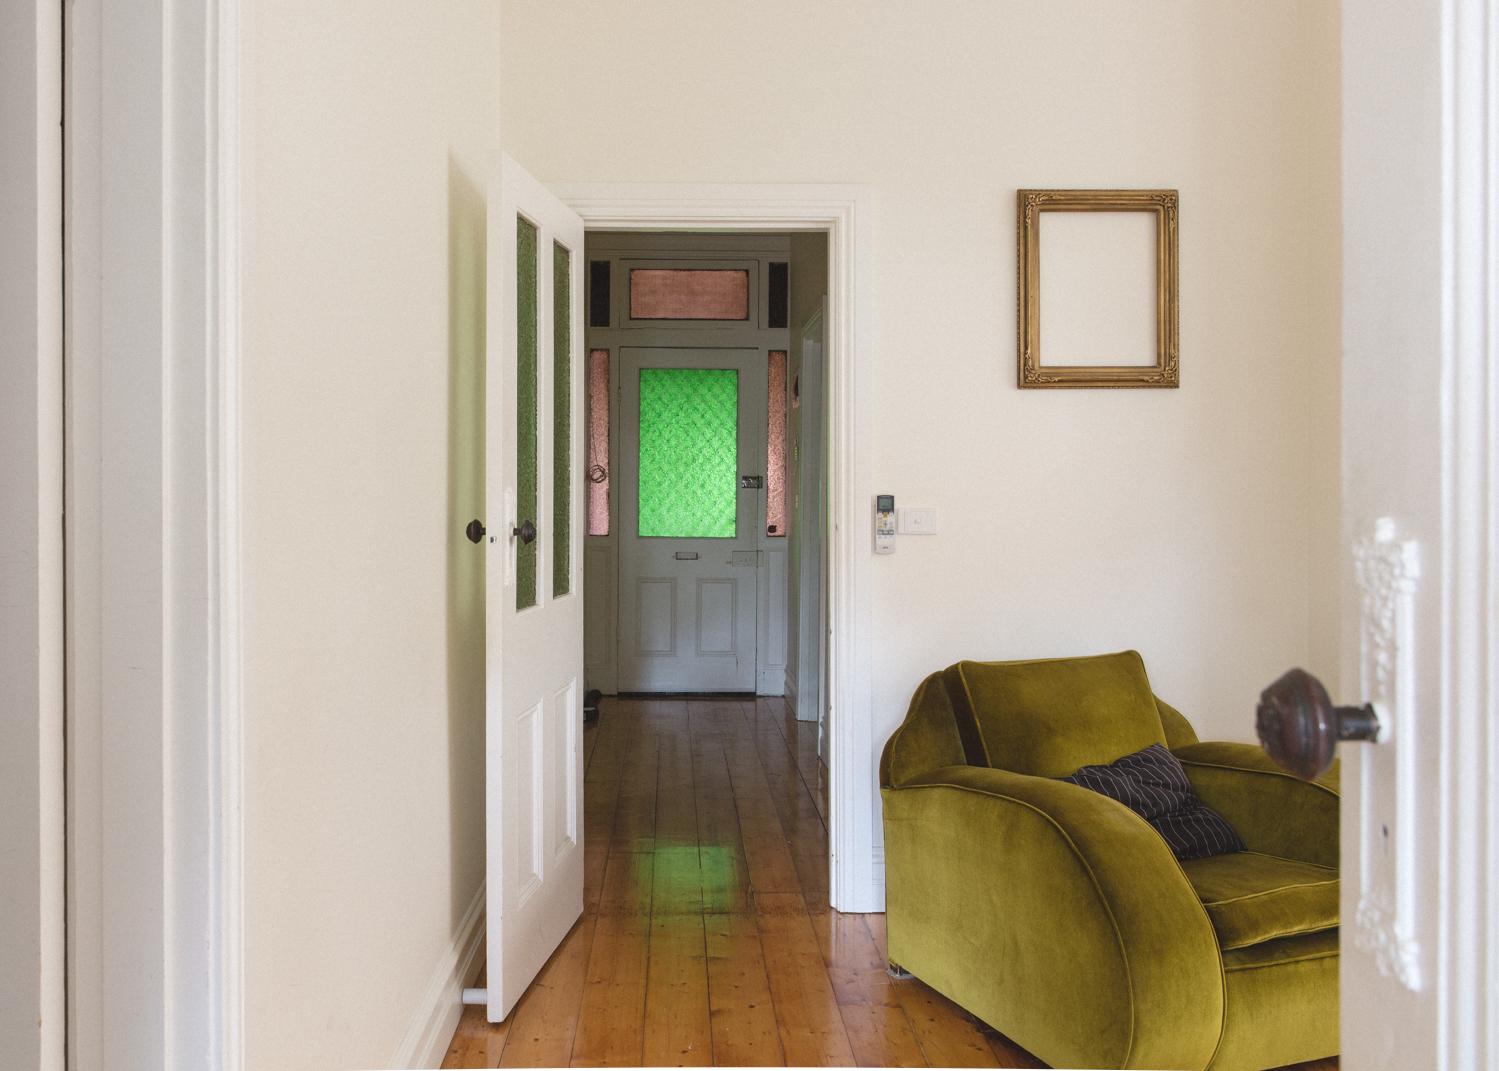 sharehome lounge room hallway emma franka martijn